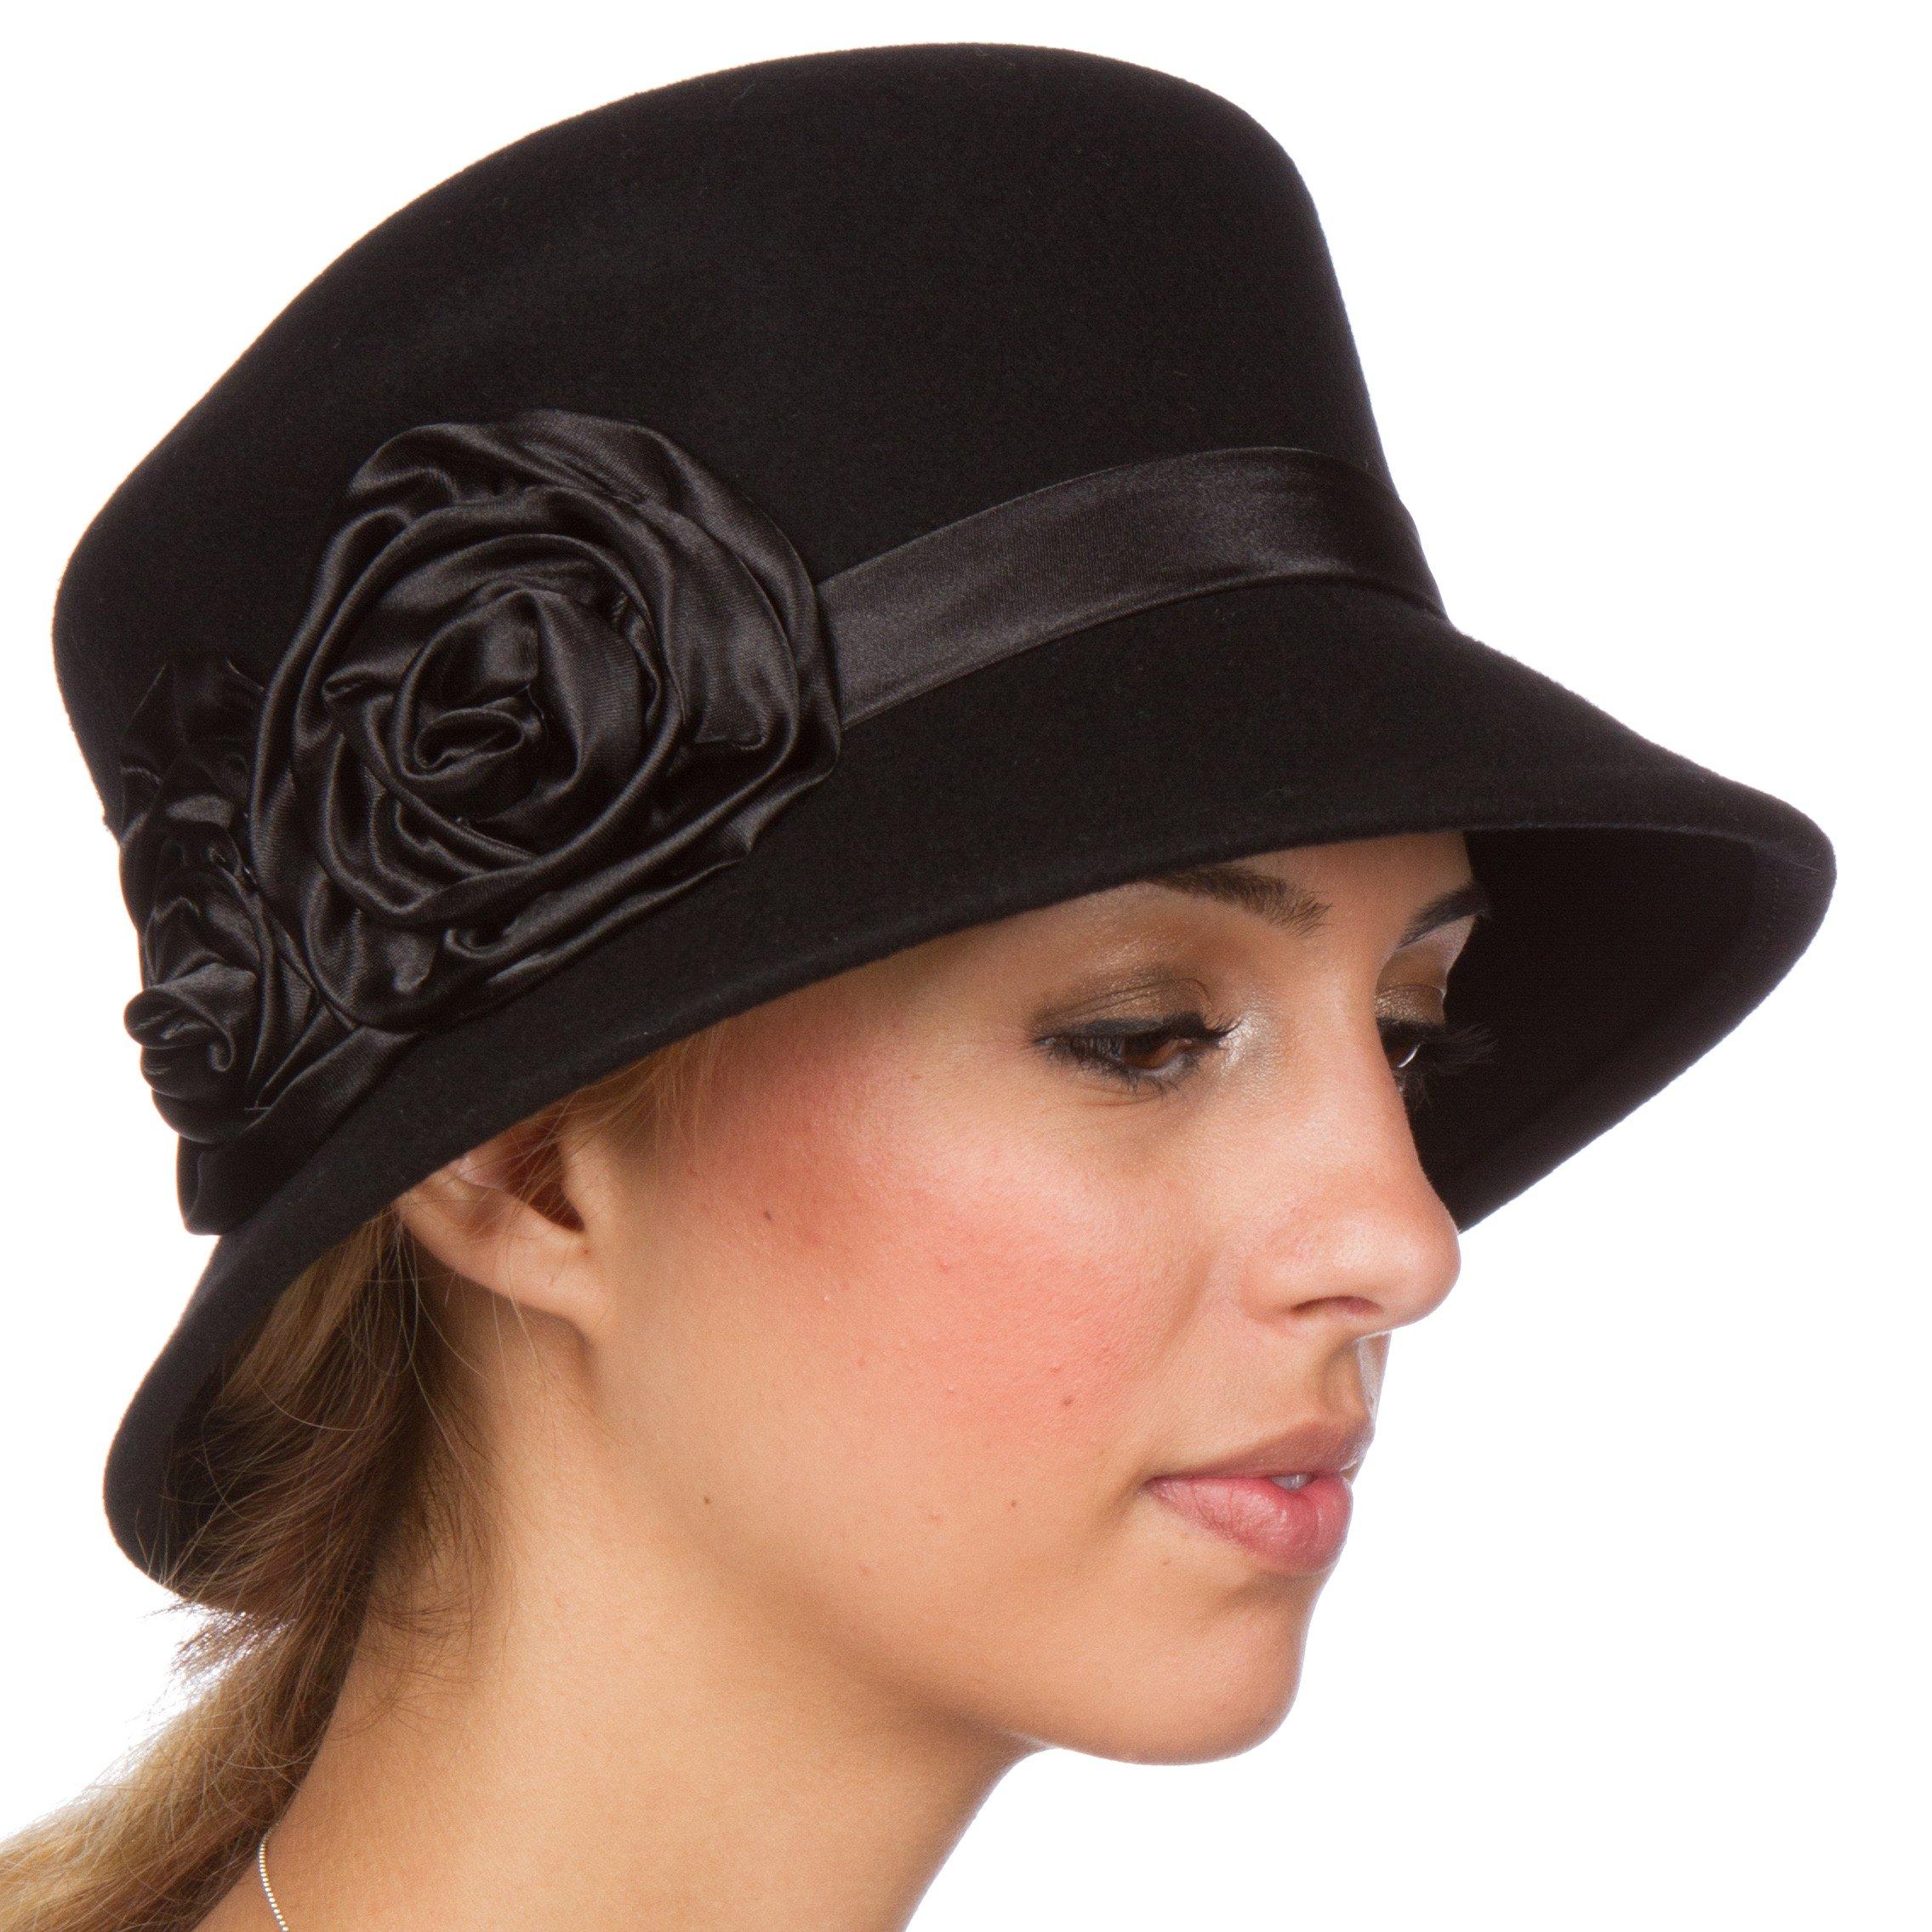 Sakkas 10M Alice Satin Rose Vintage Style Wool Cloche Hat - Black - One Size